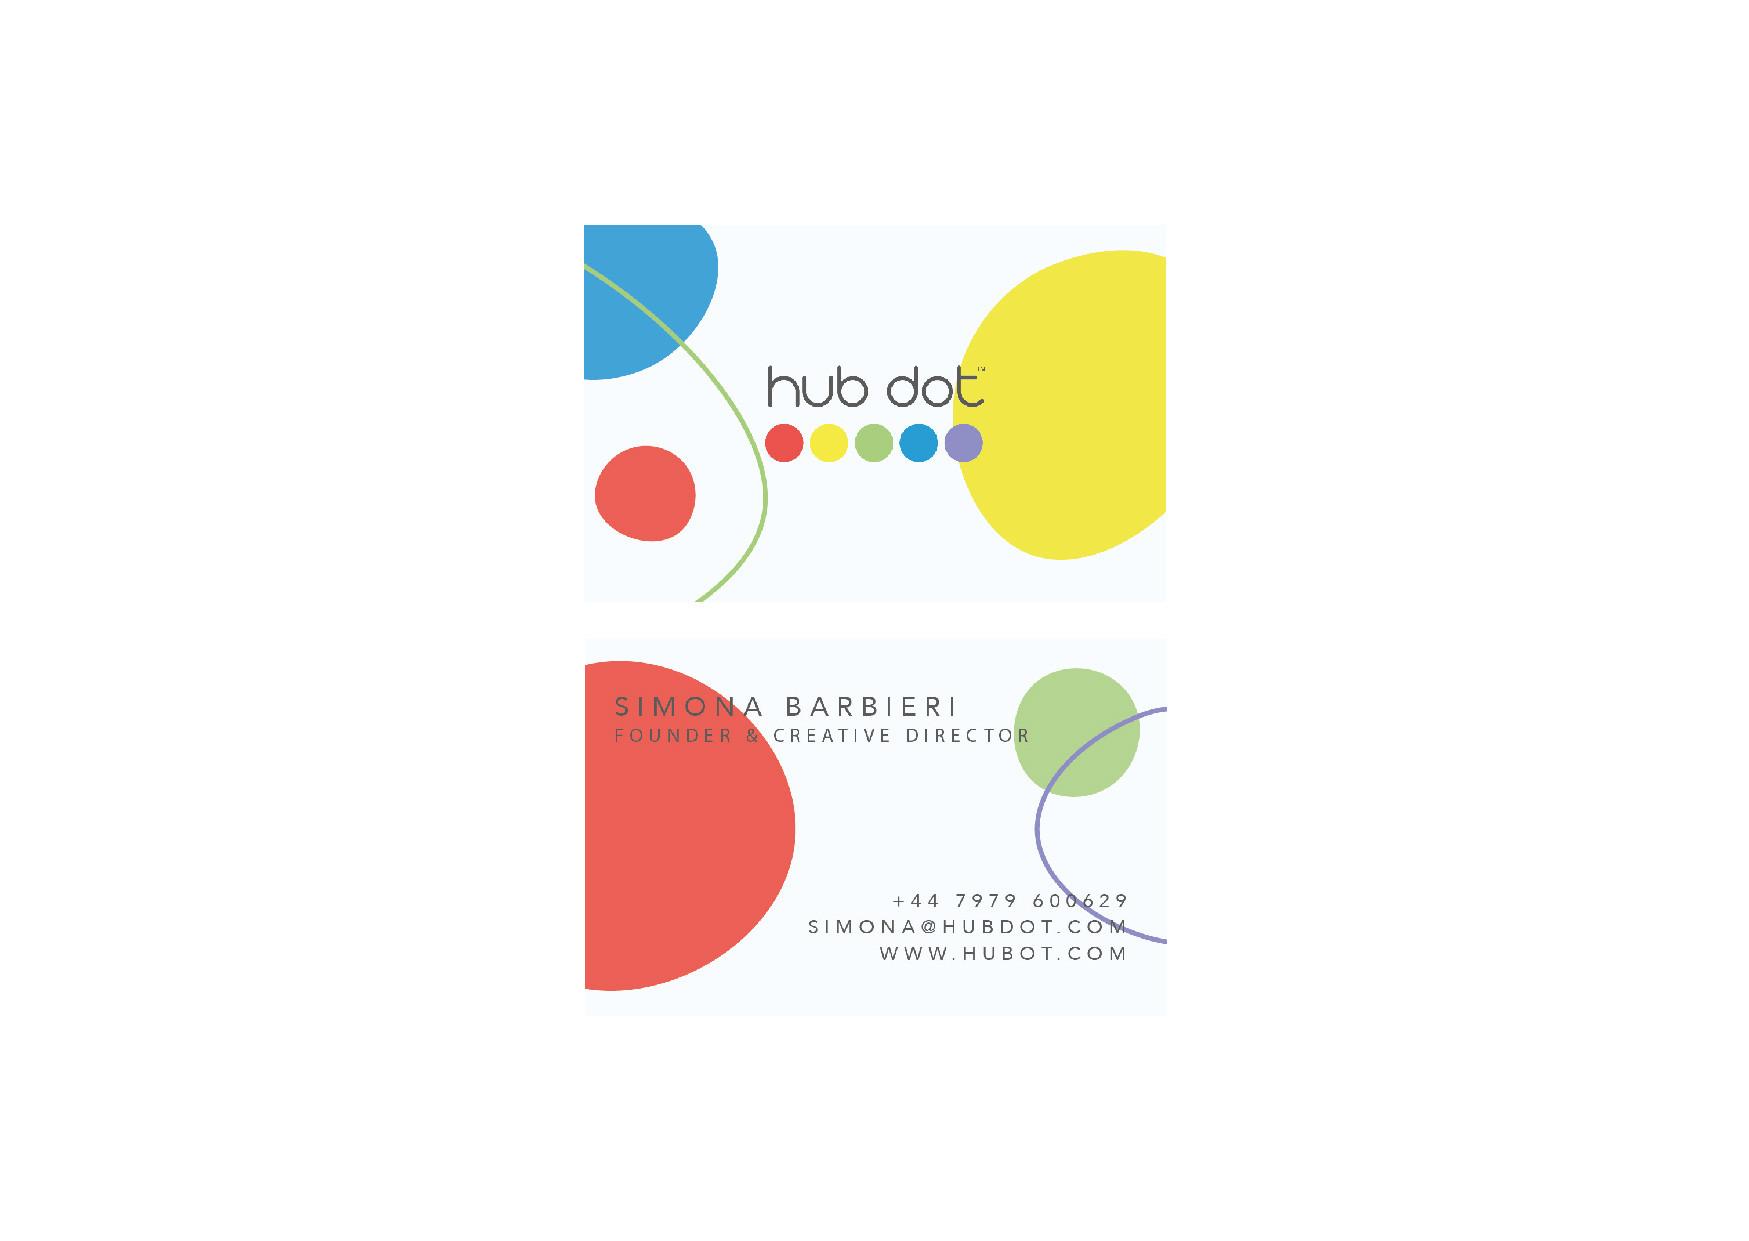 cardssimona_Logo 3.jpg